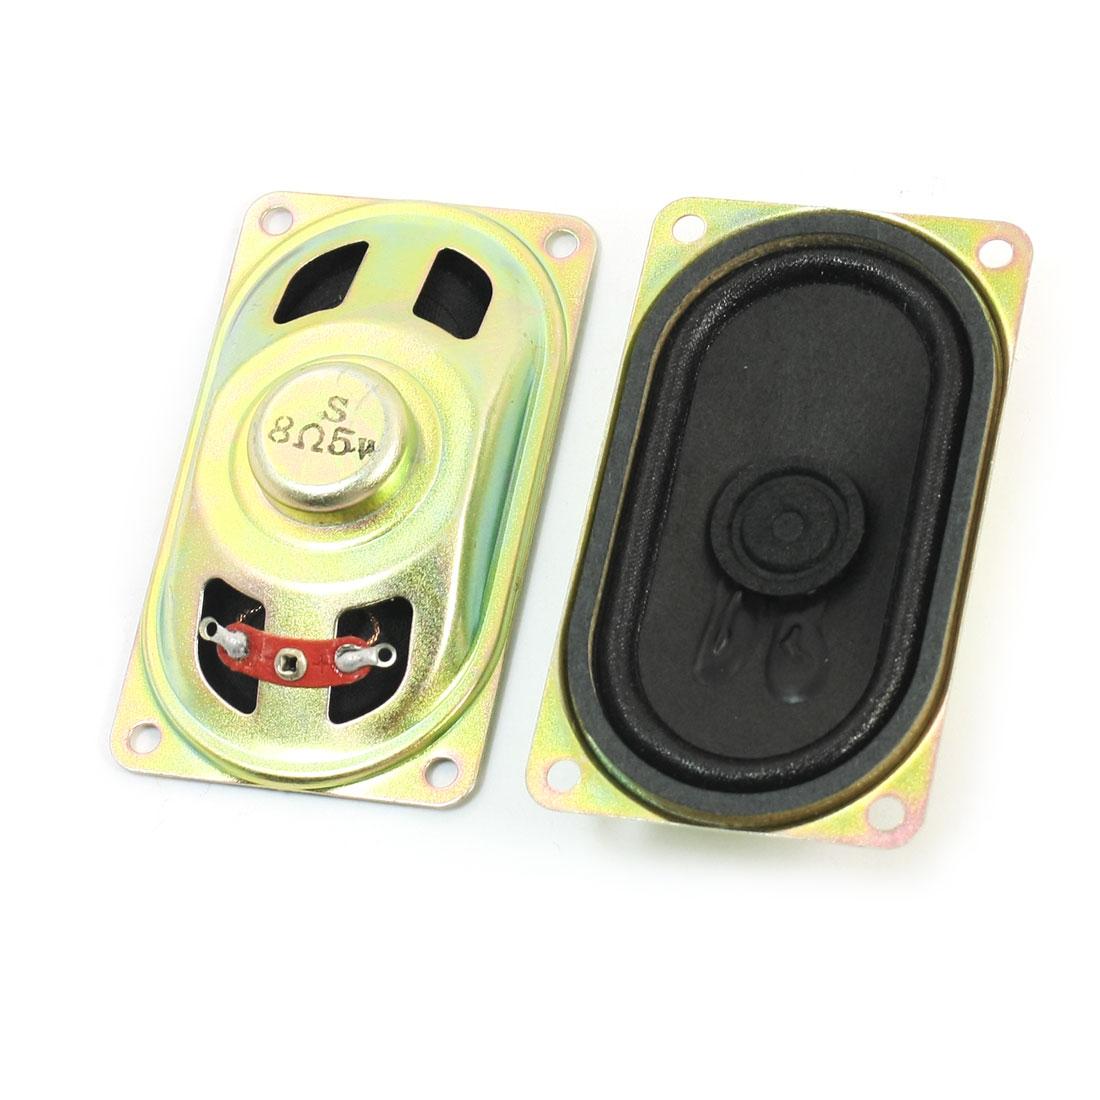 2 Pcs 70mm x 40mm Rectangle Metal Case Magnetic Type LCD TV Player Audio Speaker Amplifier Loudspeaker 5W 8 Ohm